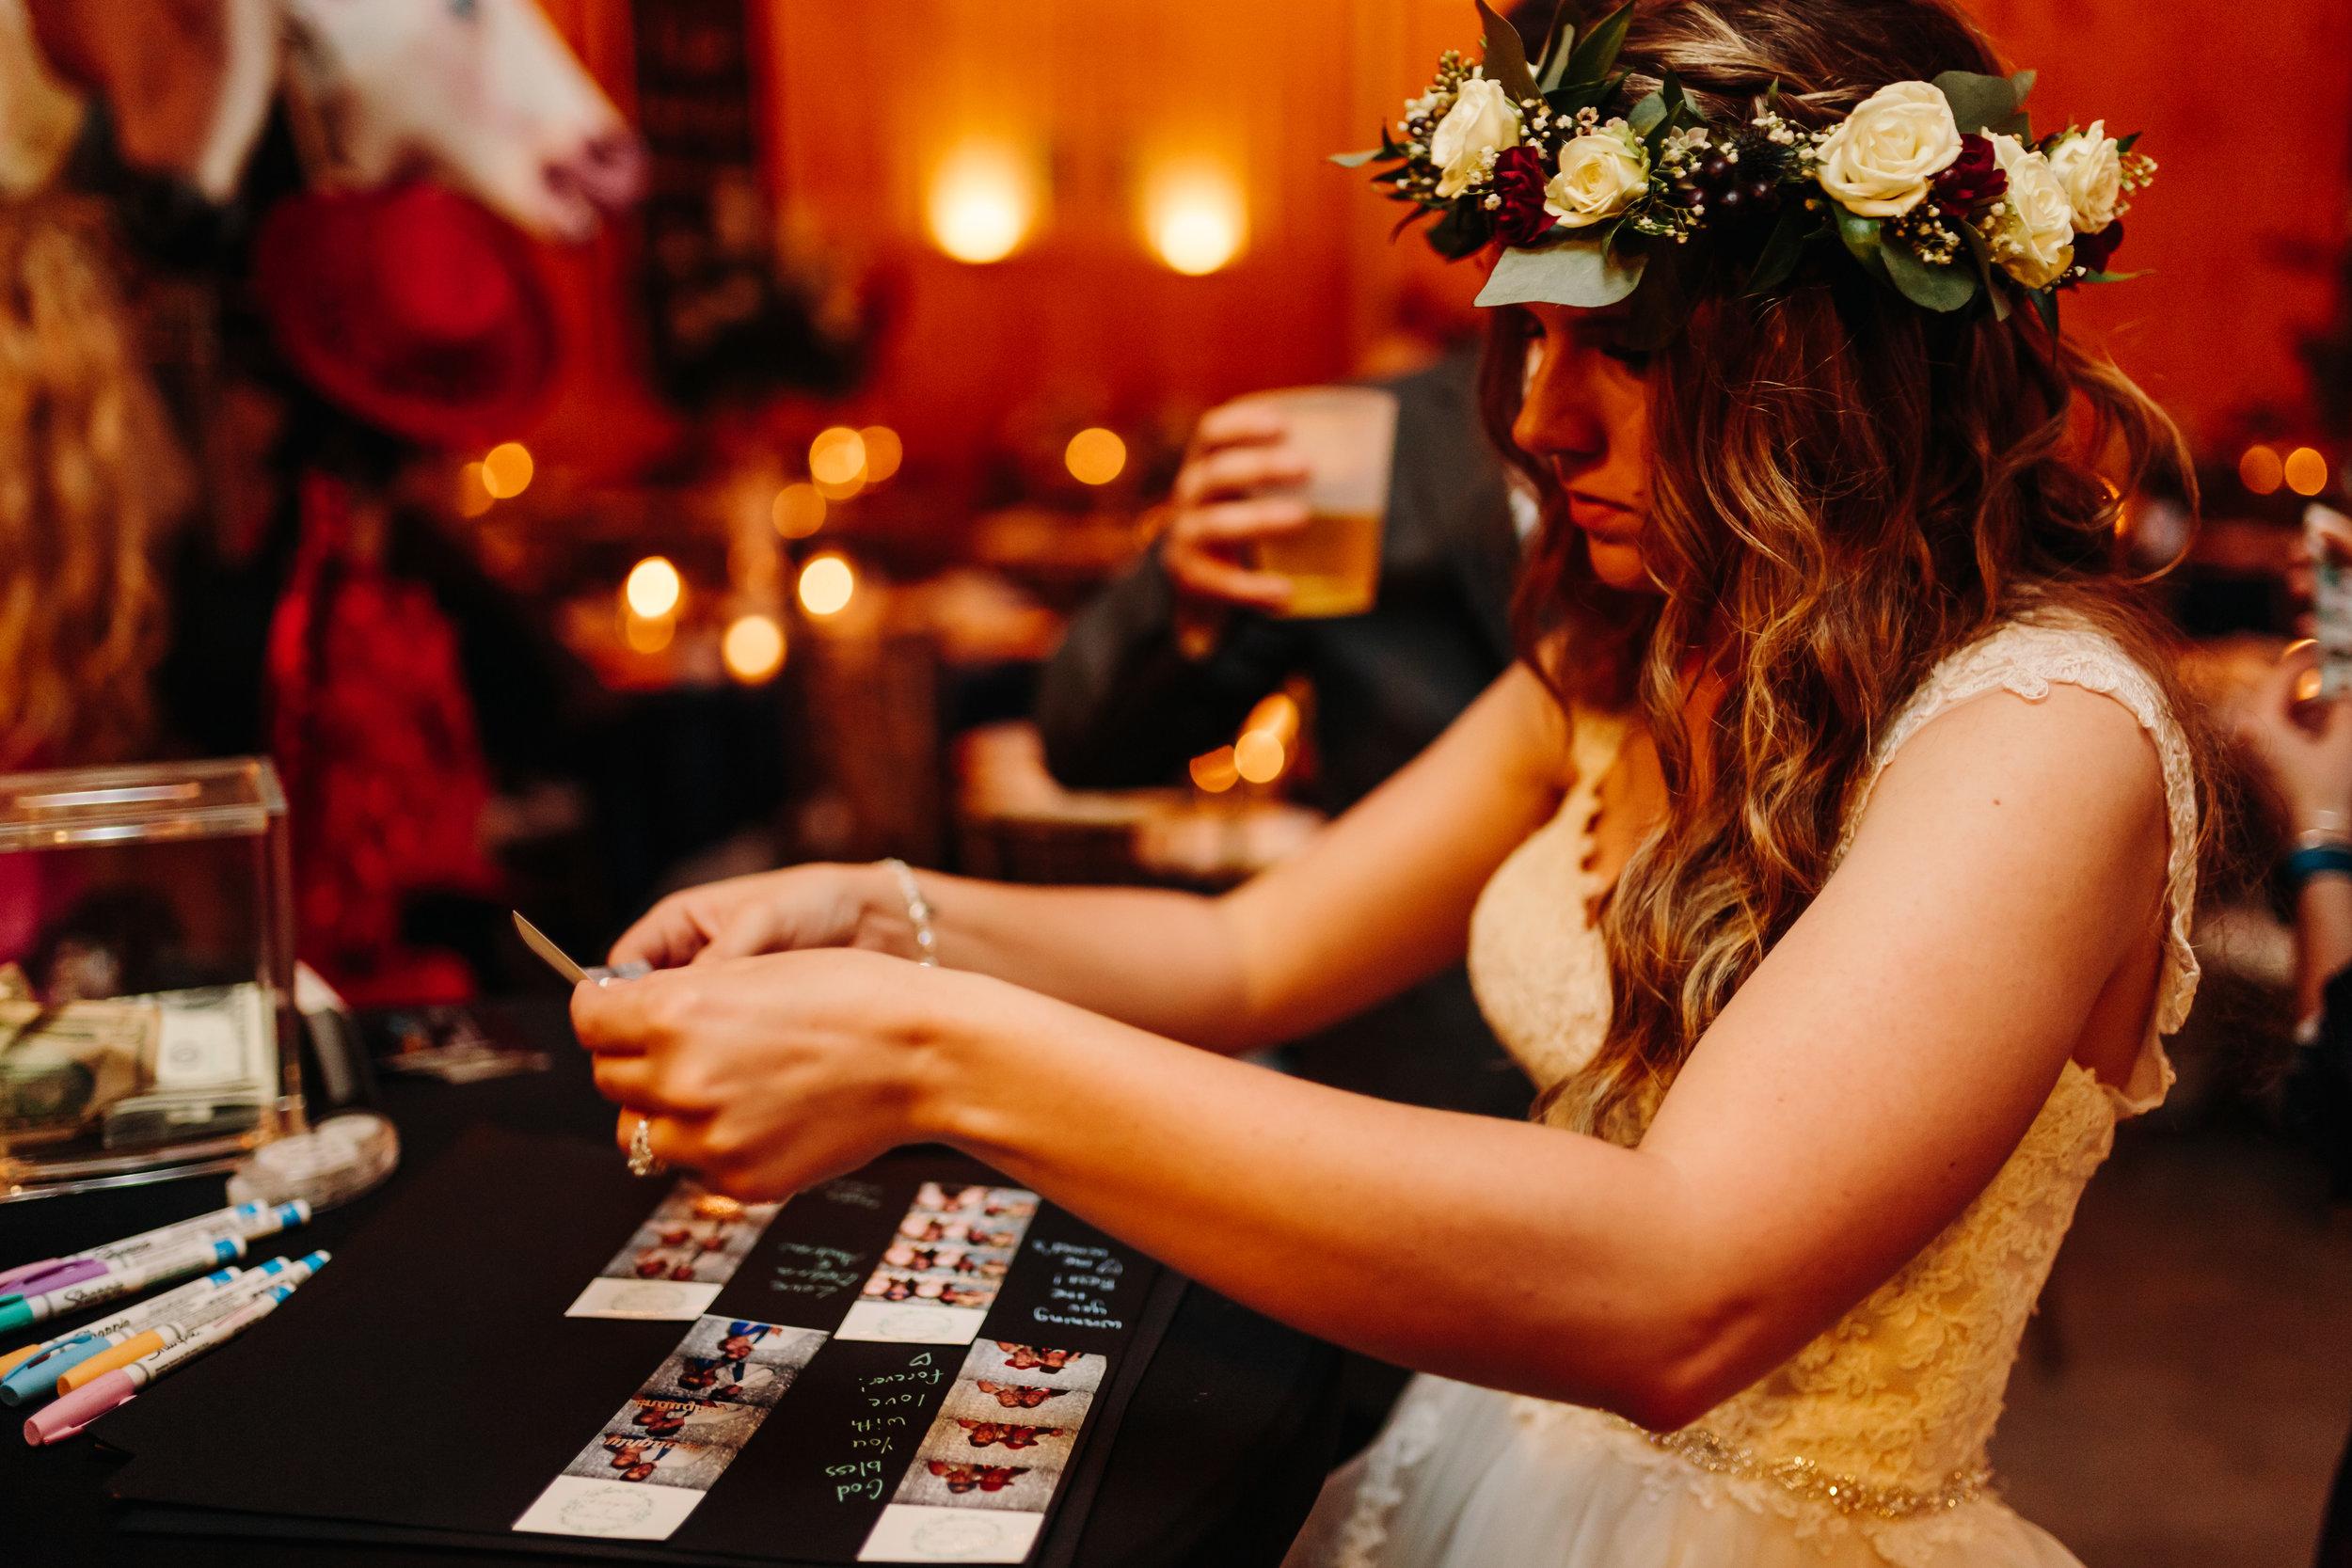 2018.04.14 Zak and Jamisyn Unrue Black Willow Barn Wedding Finals-840.jpg